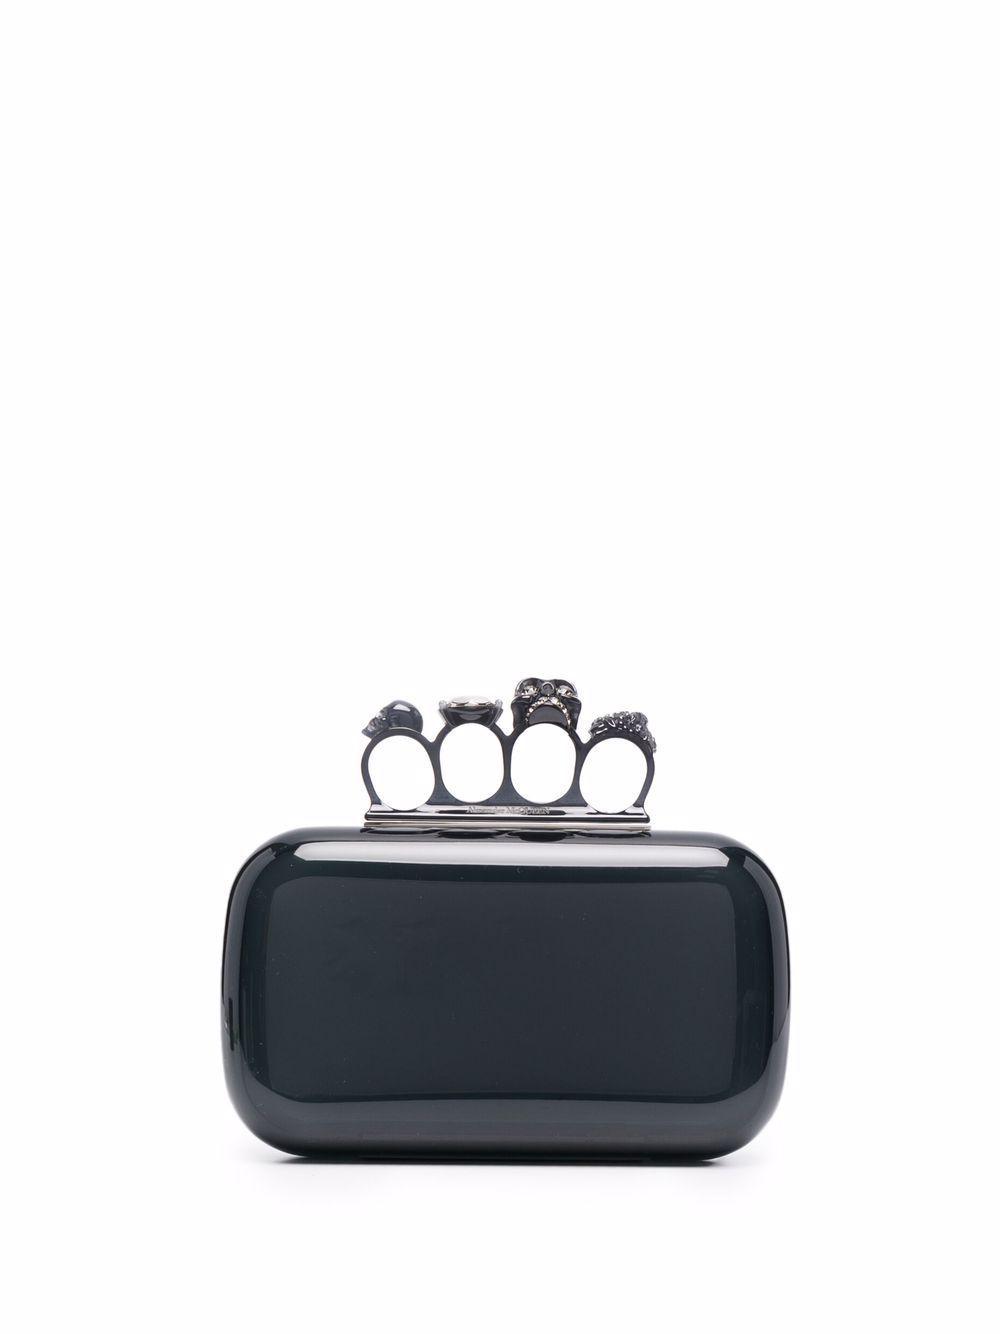 Borsa clutch four ring in pelle